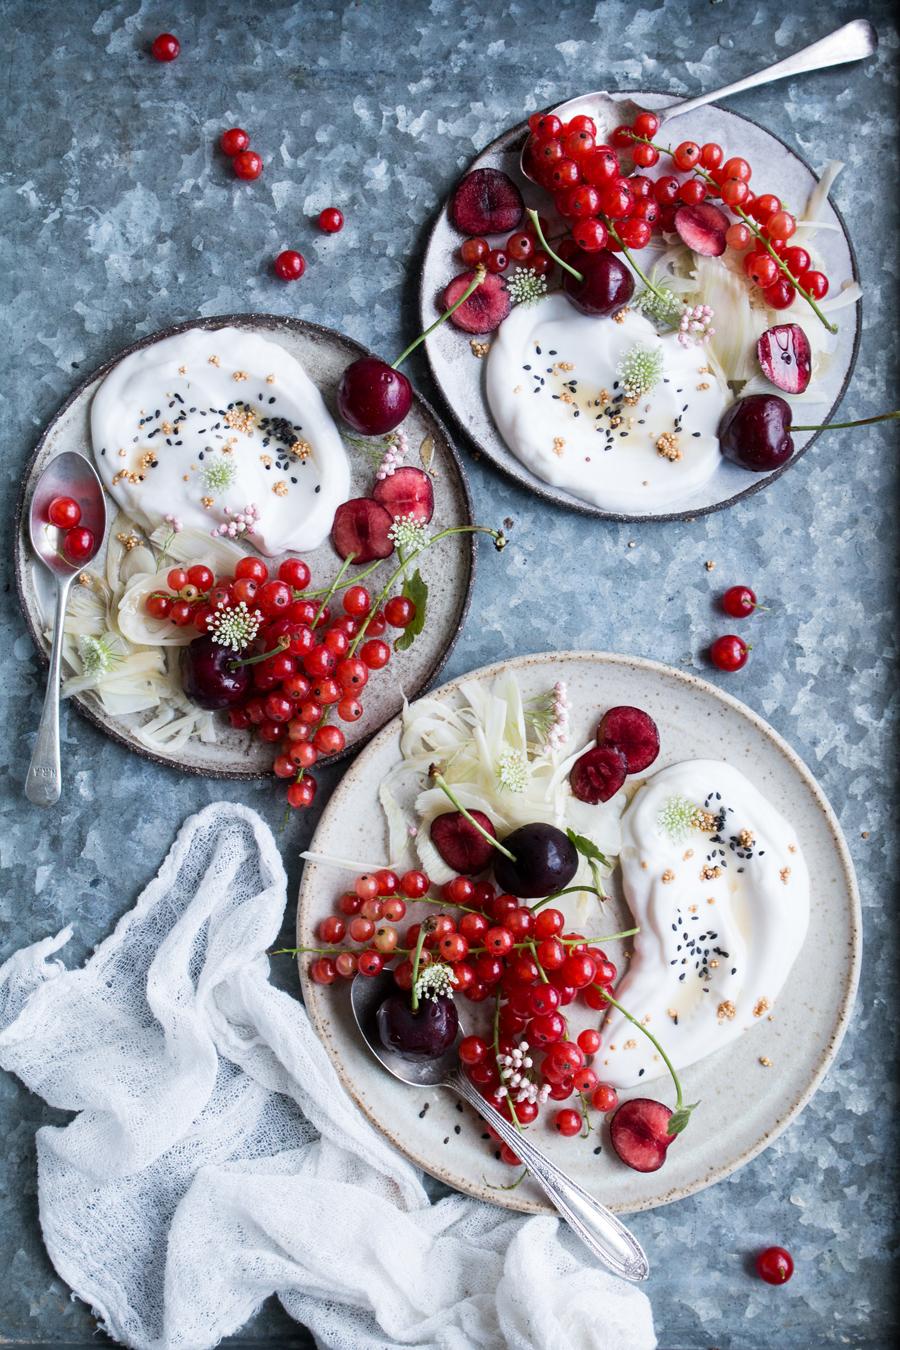 vegan-berry-fennel-salad-recipe-7